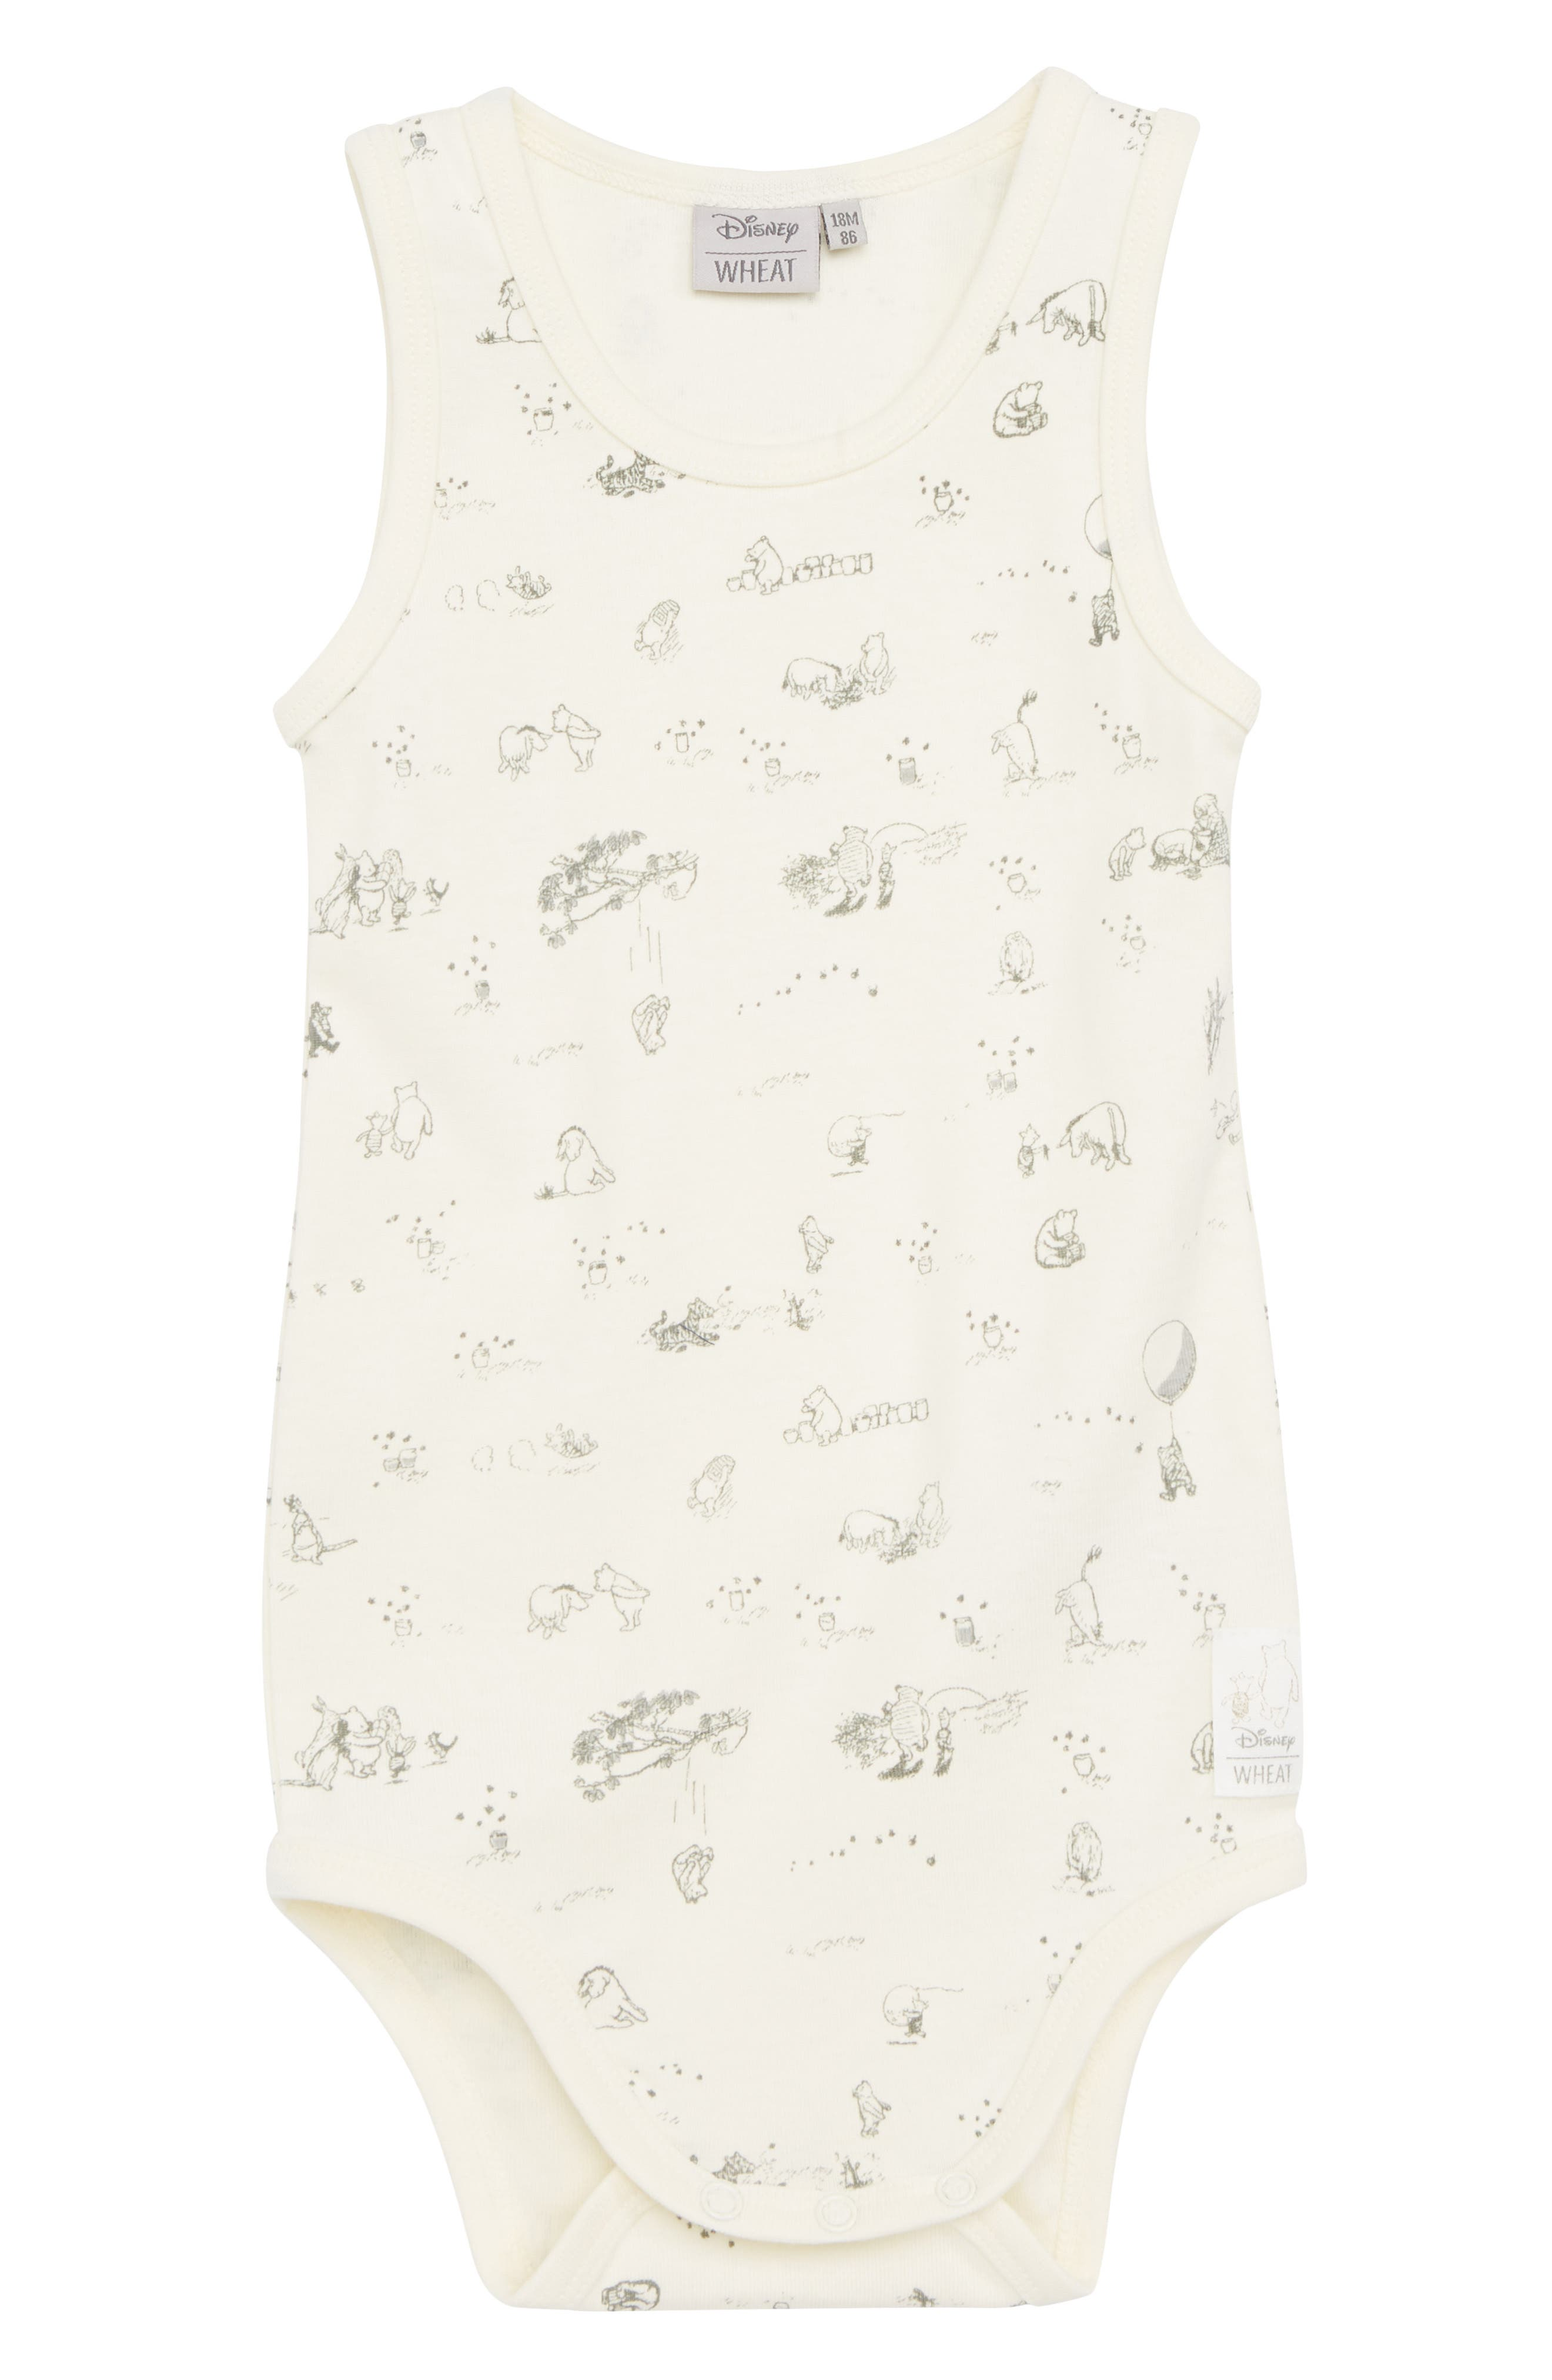 x Disney<sup>®</sup> Winnie the Pooh Organic Cotton Bodysuit,                             Main thumbnail 1, color,                             902